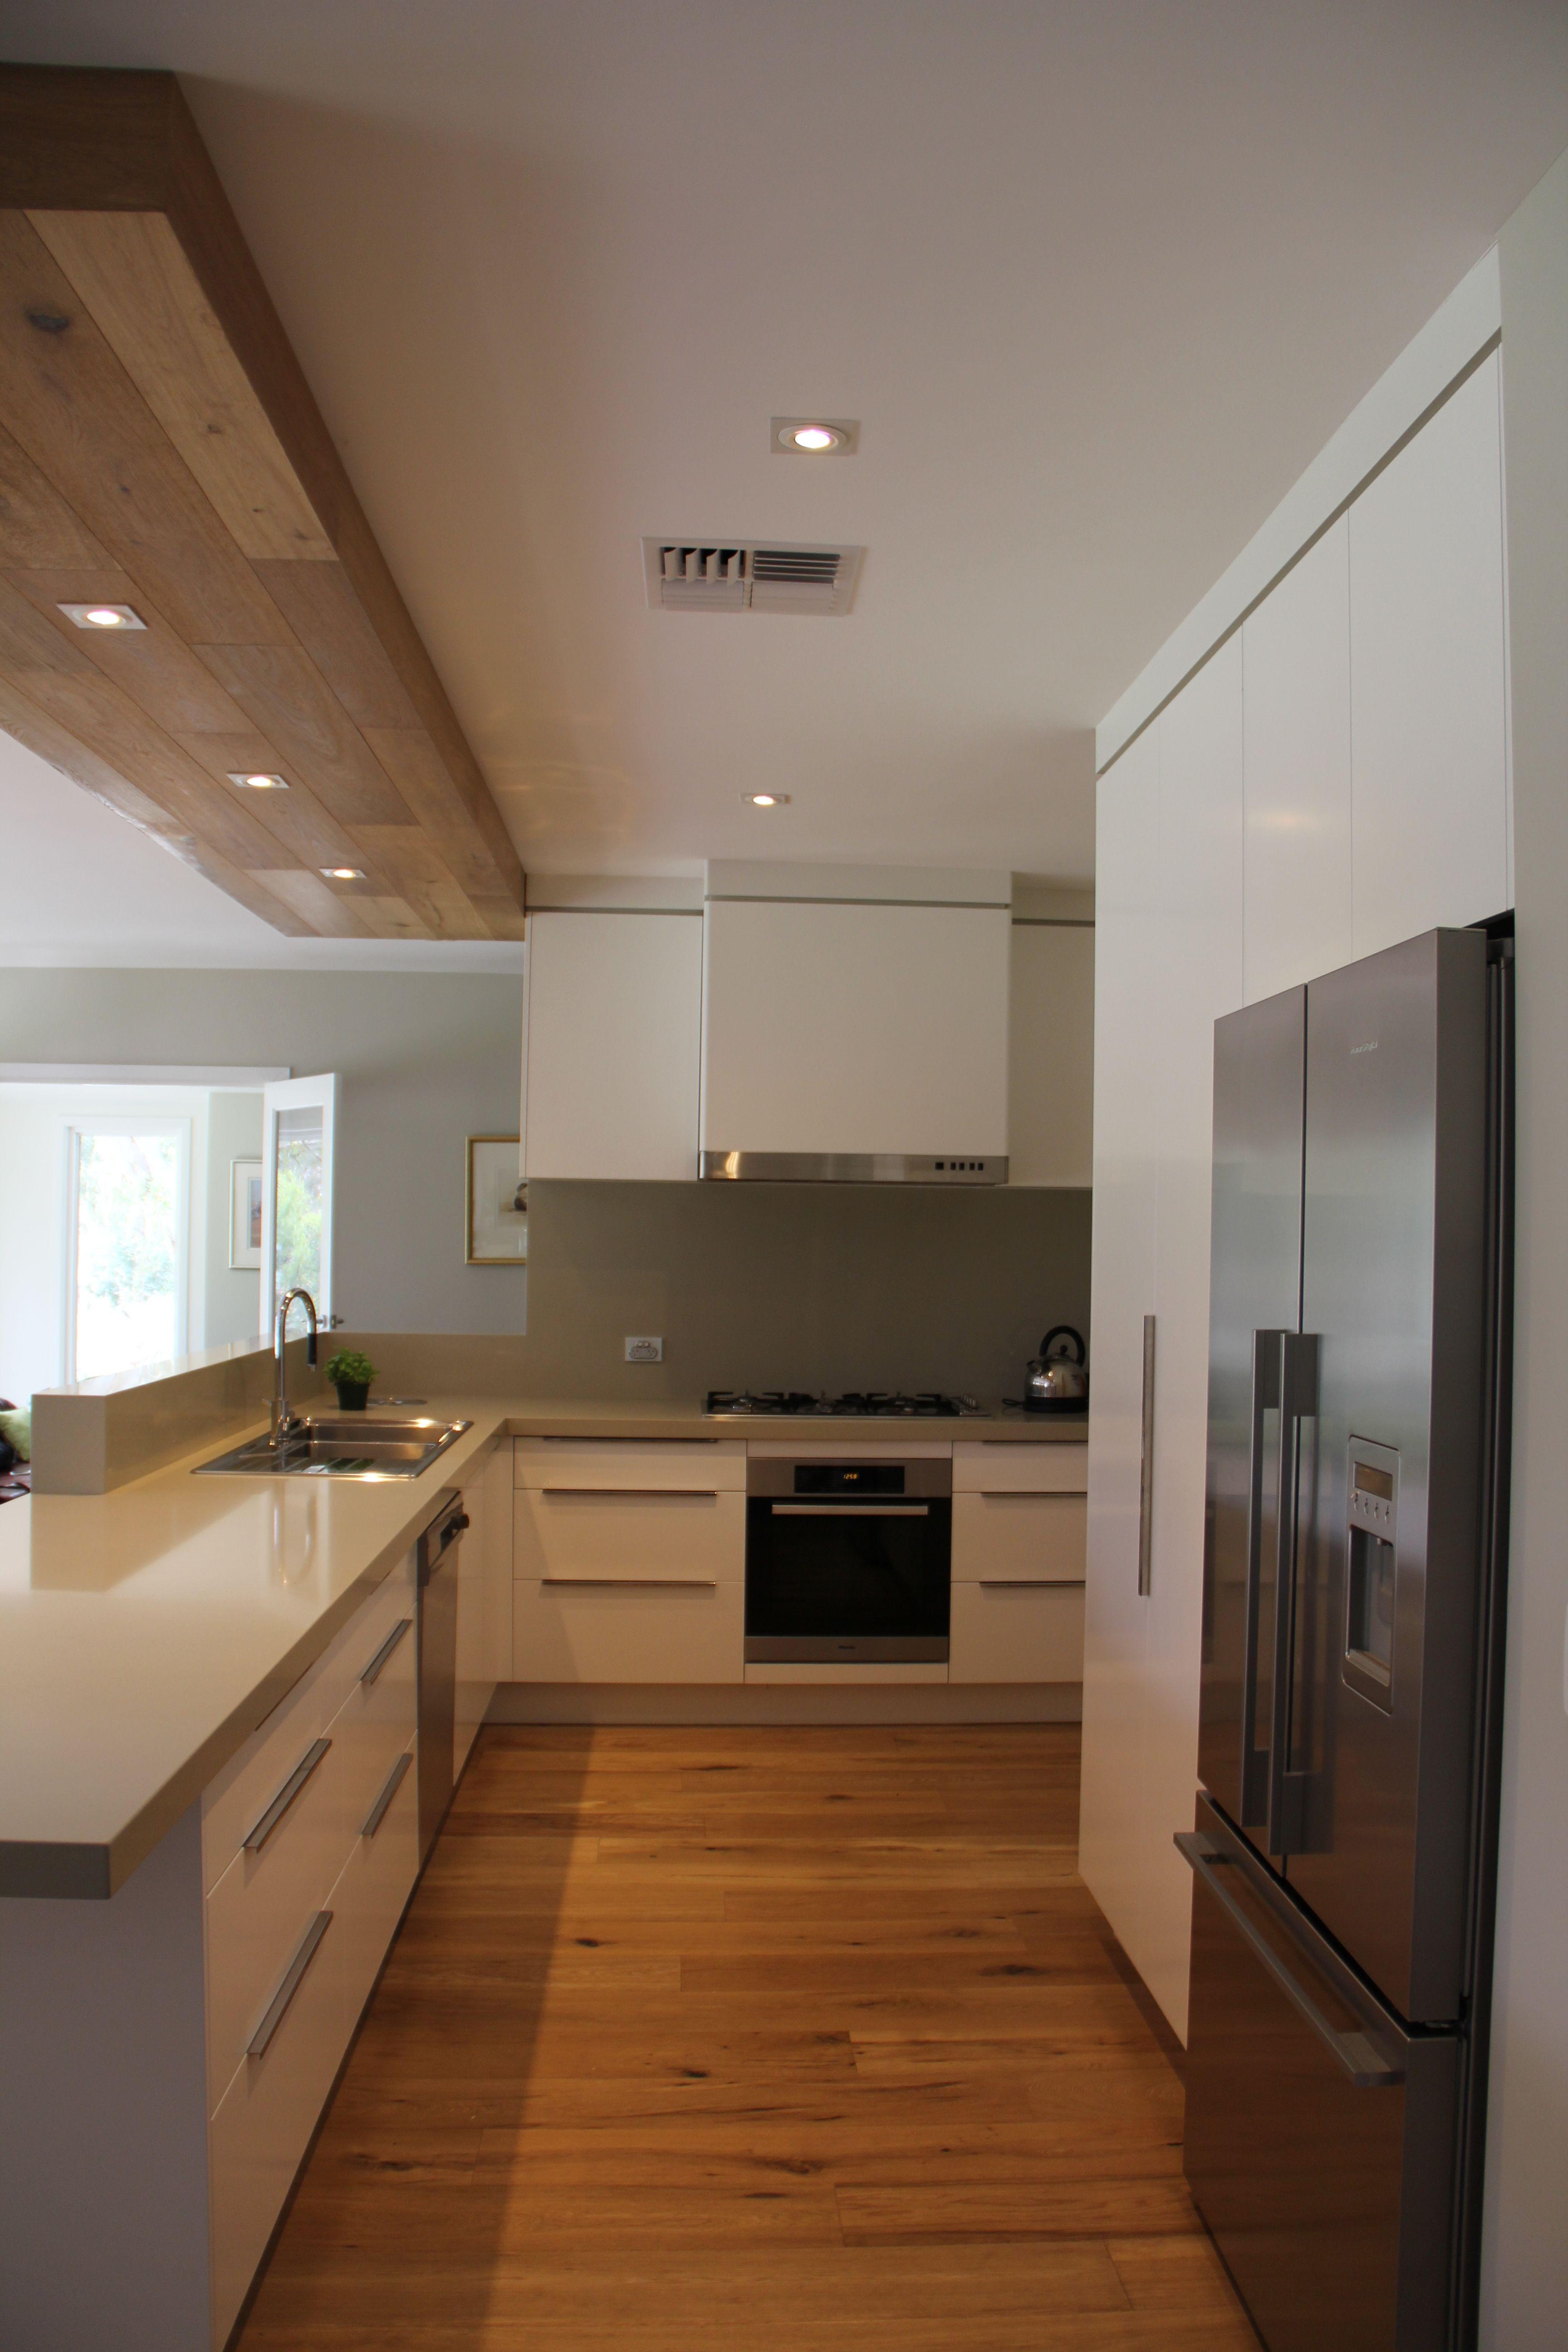 Smoked American Oak Floors And Bulkhead Design By Plumb Interior Design